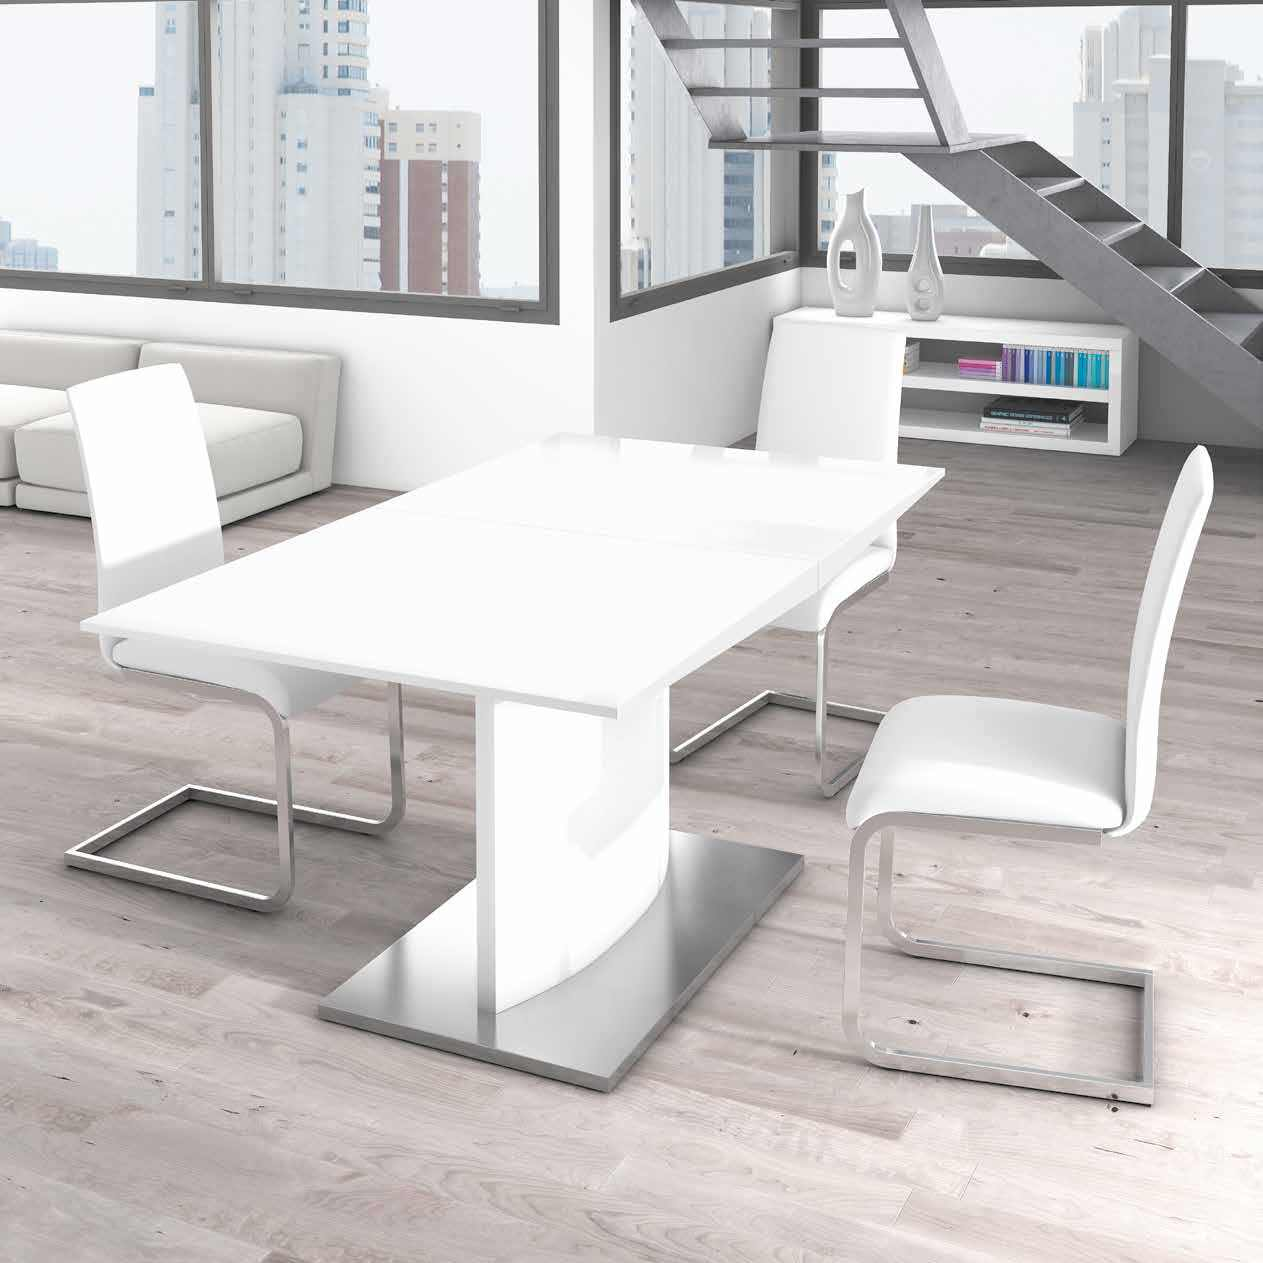 Mesa de comedor martcolon contempor nea en blanco brillo for Mesa comedor blanco brillo